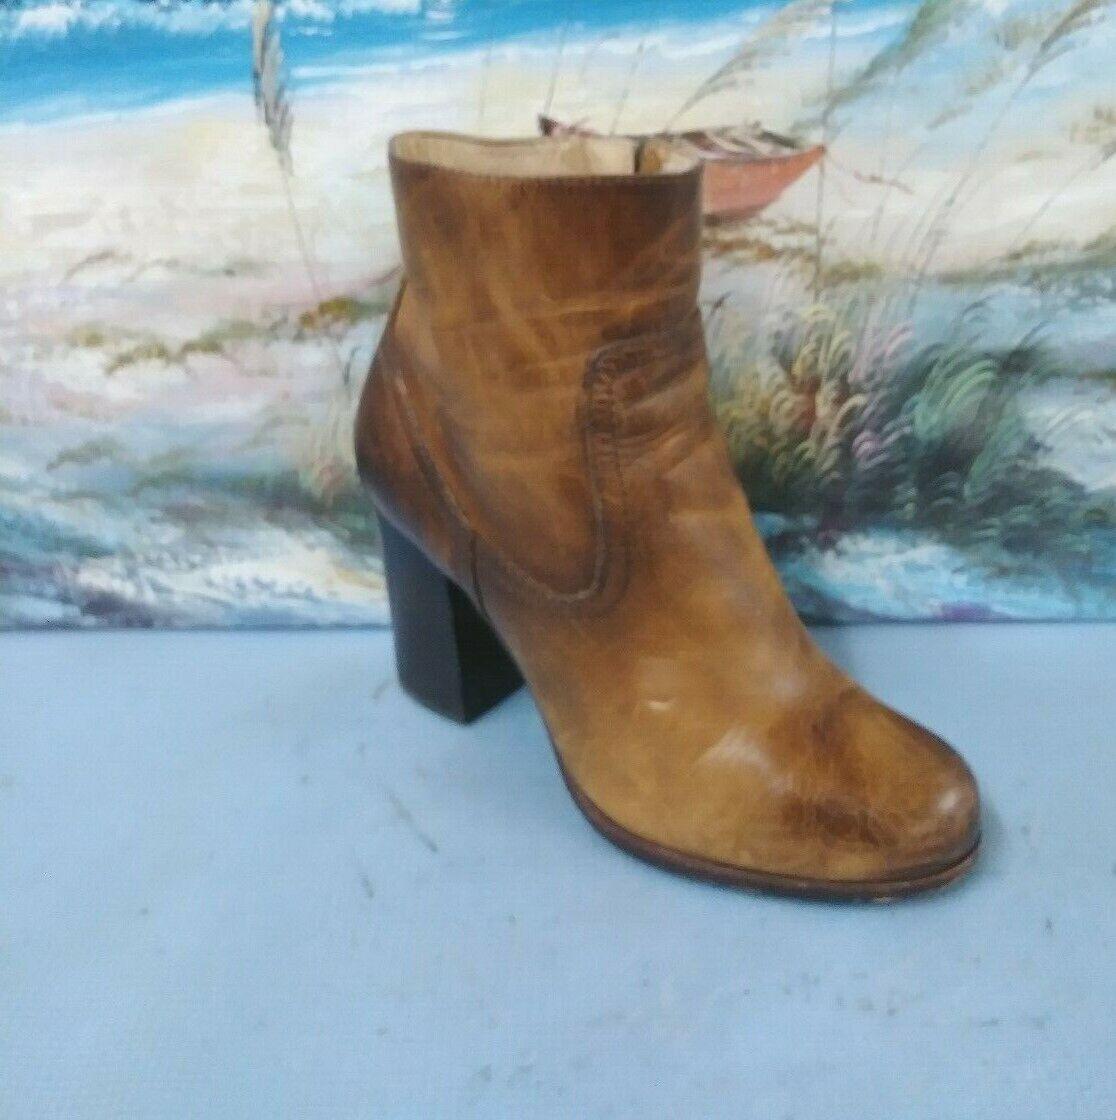 FRYE WOMES WOMES WOMES Western Ankle ZIPER TAN Boot Storlek 8.5 M 3476641  bästa kvalitet